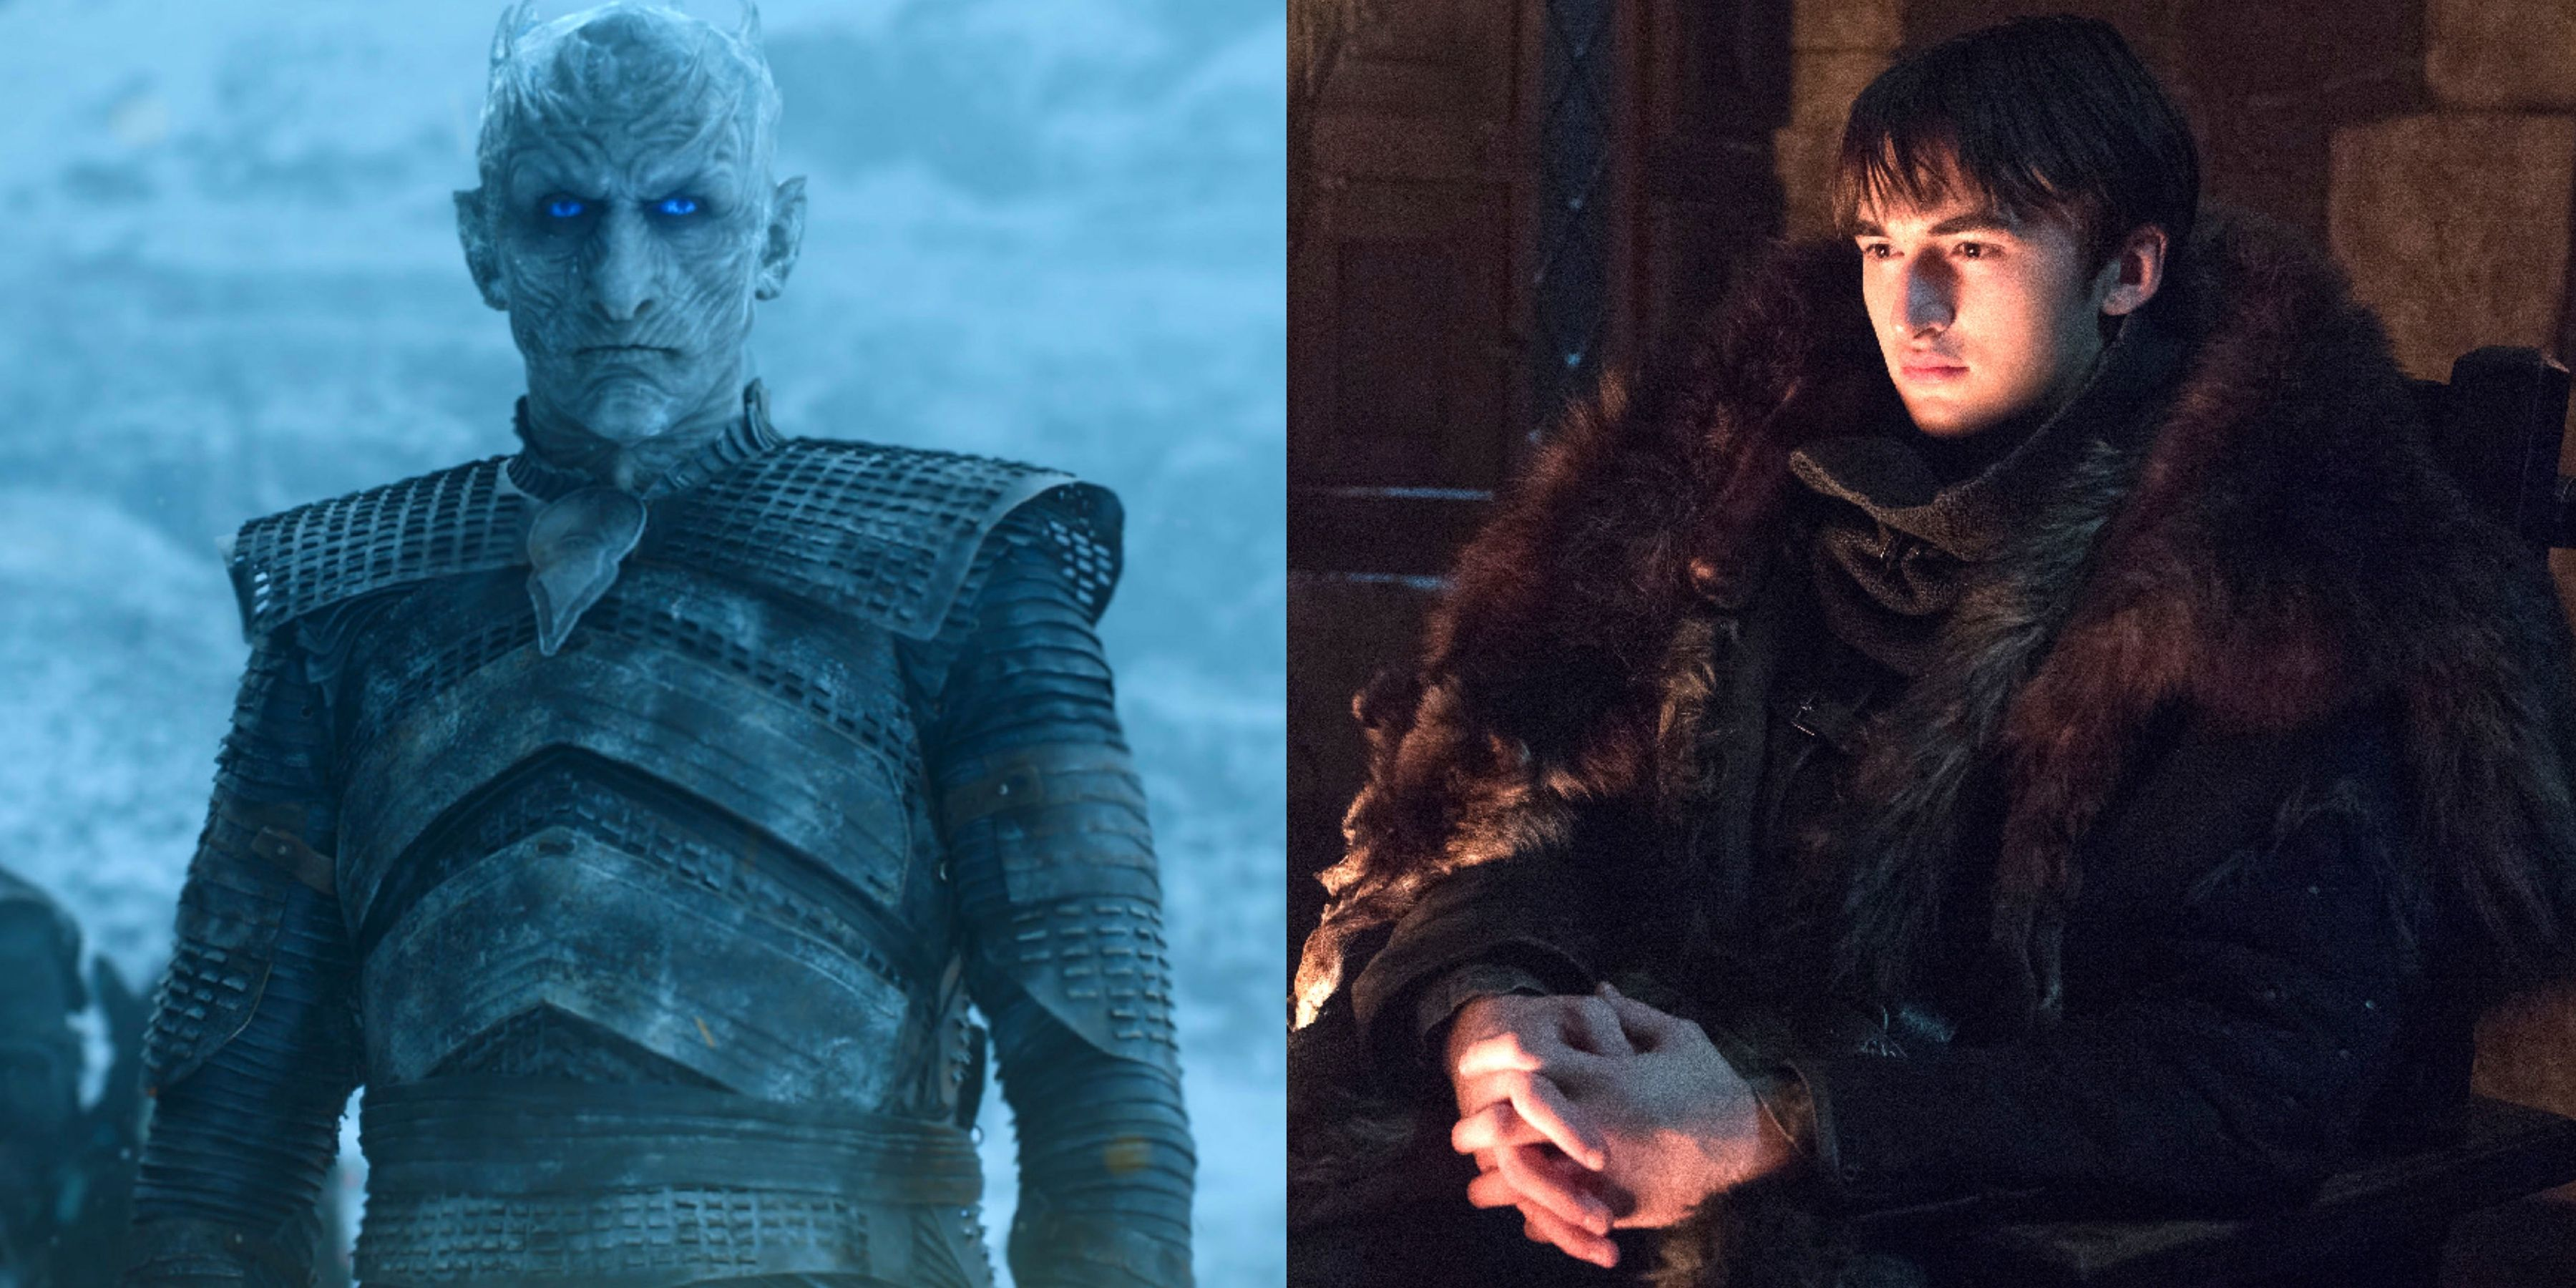 Game of Thrones Season 8 Bran Night King Theory - The Three